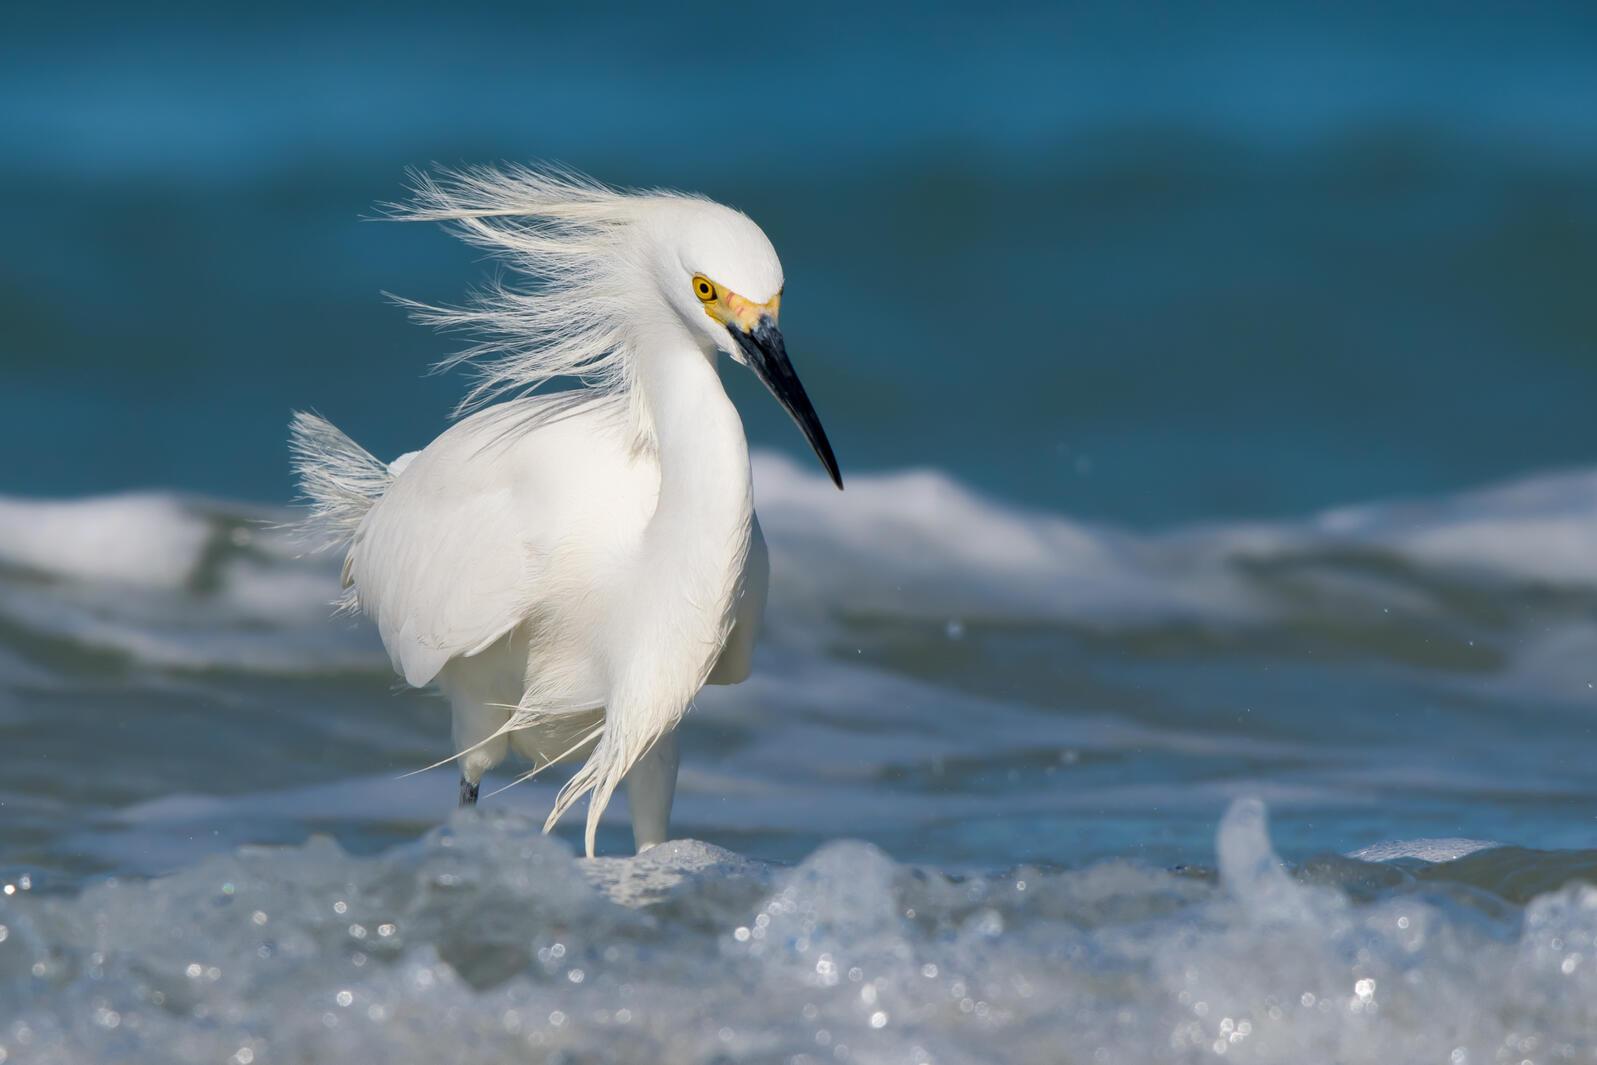 Snowy Egret. Jesse Gordon/Audubon Photography Awards